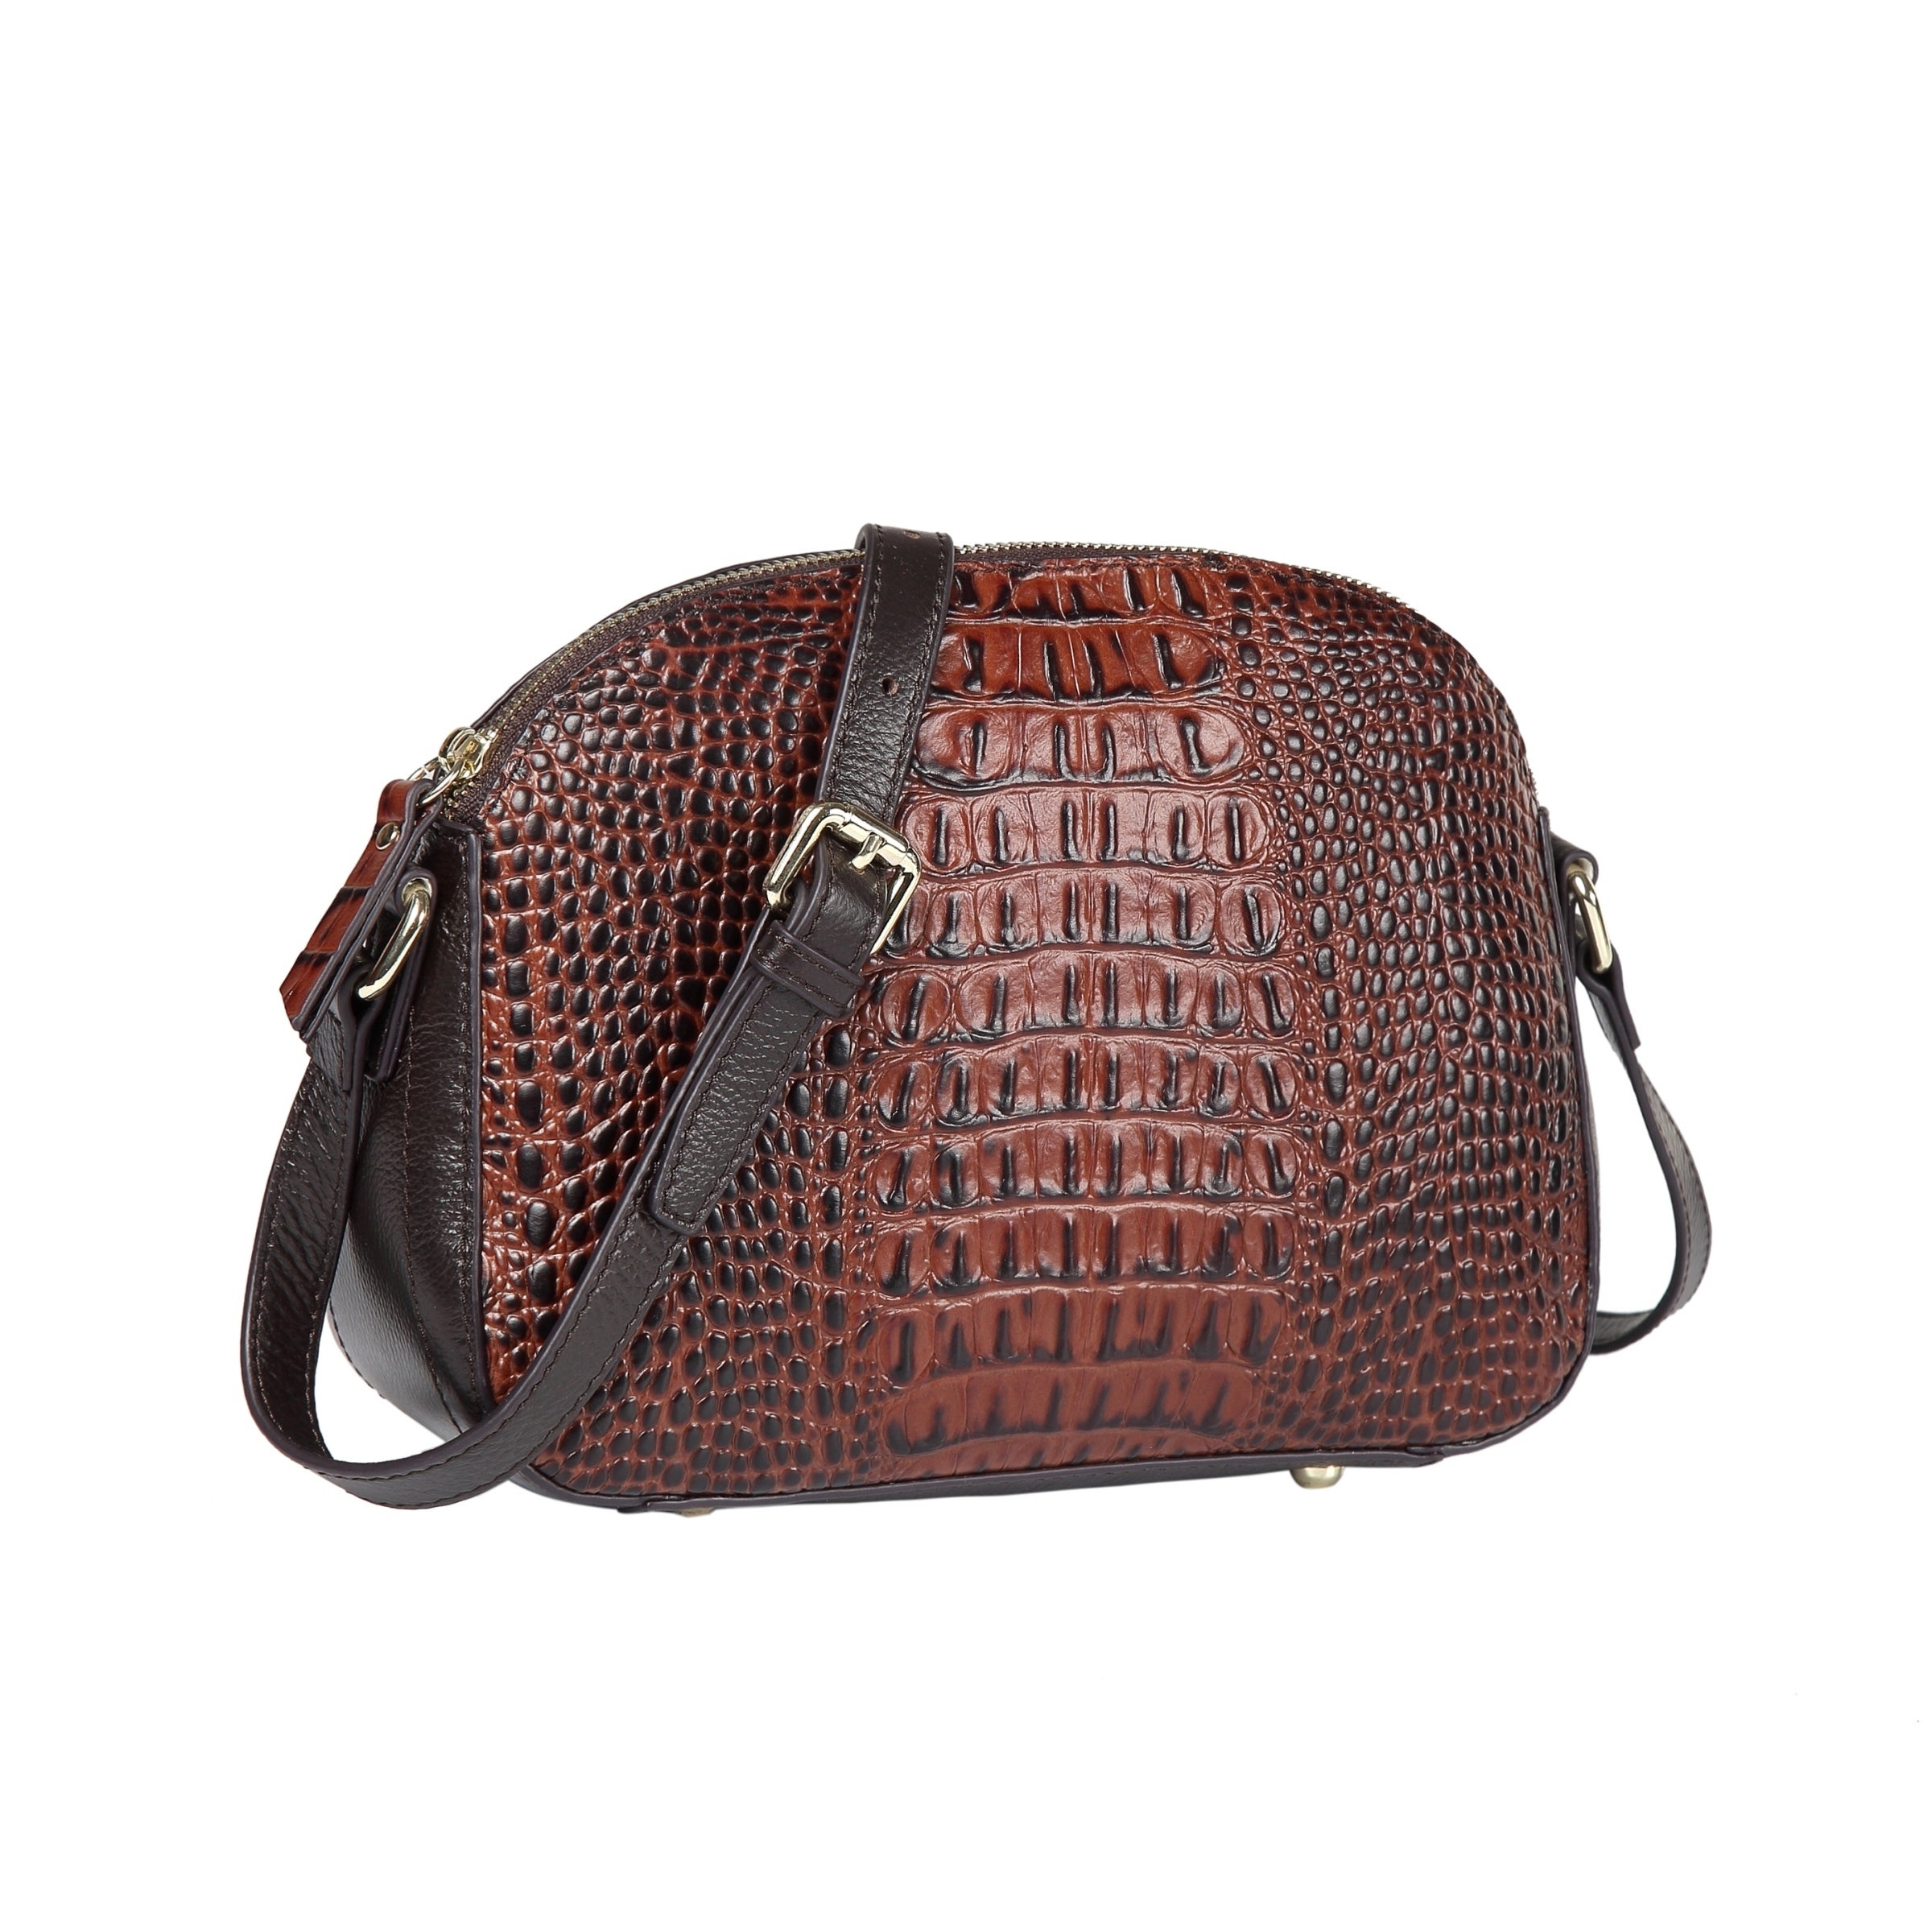 0b4a28b78780 Remmy Croc Embossed Leather Crossbody Bag